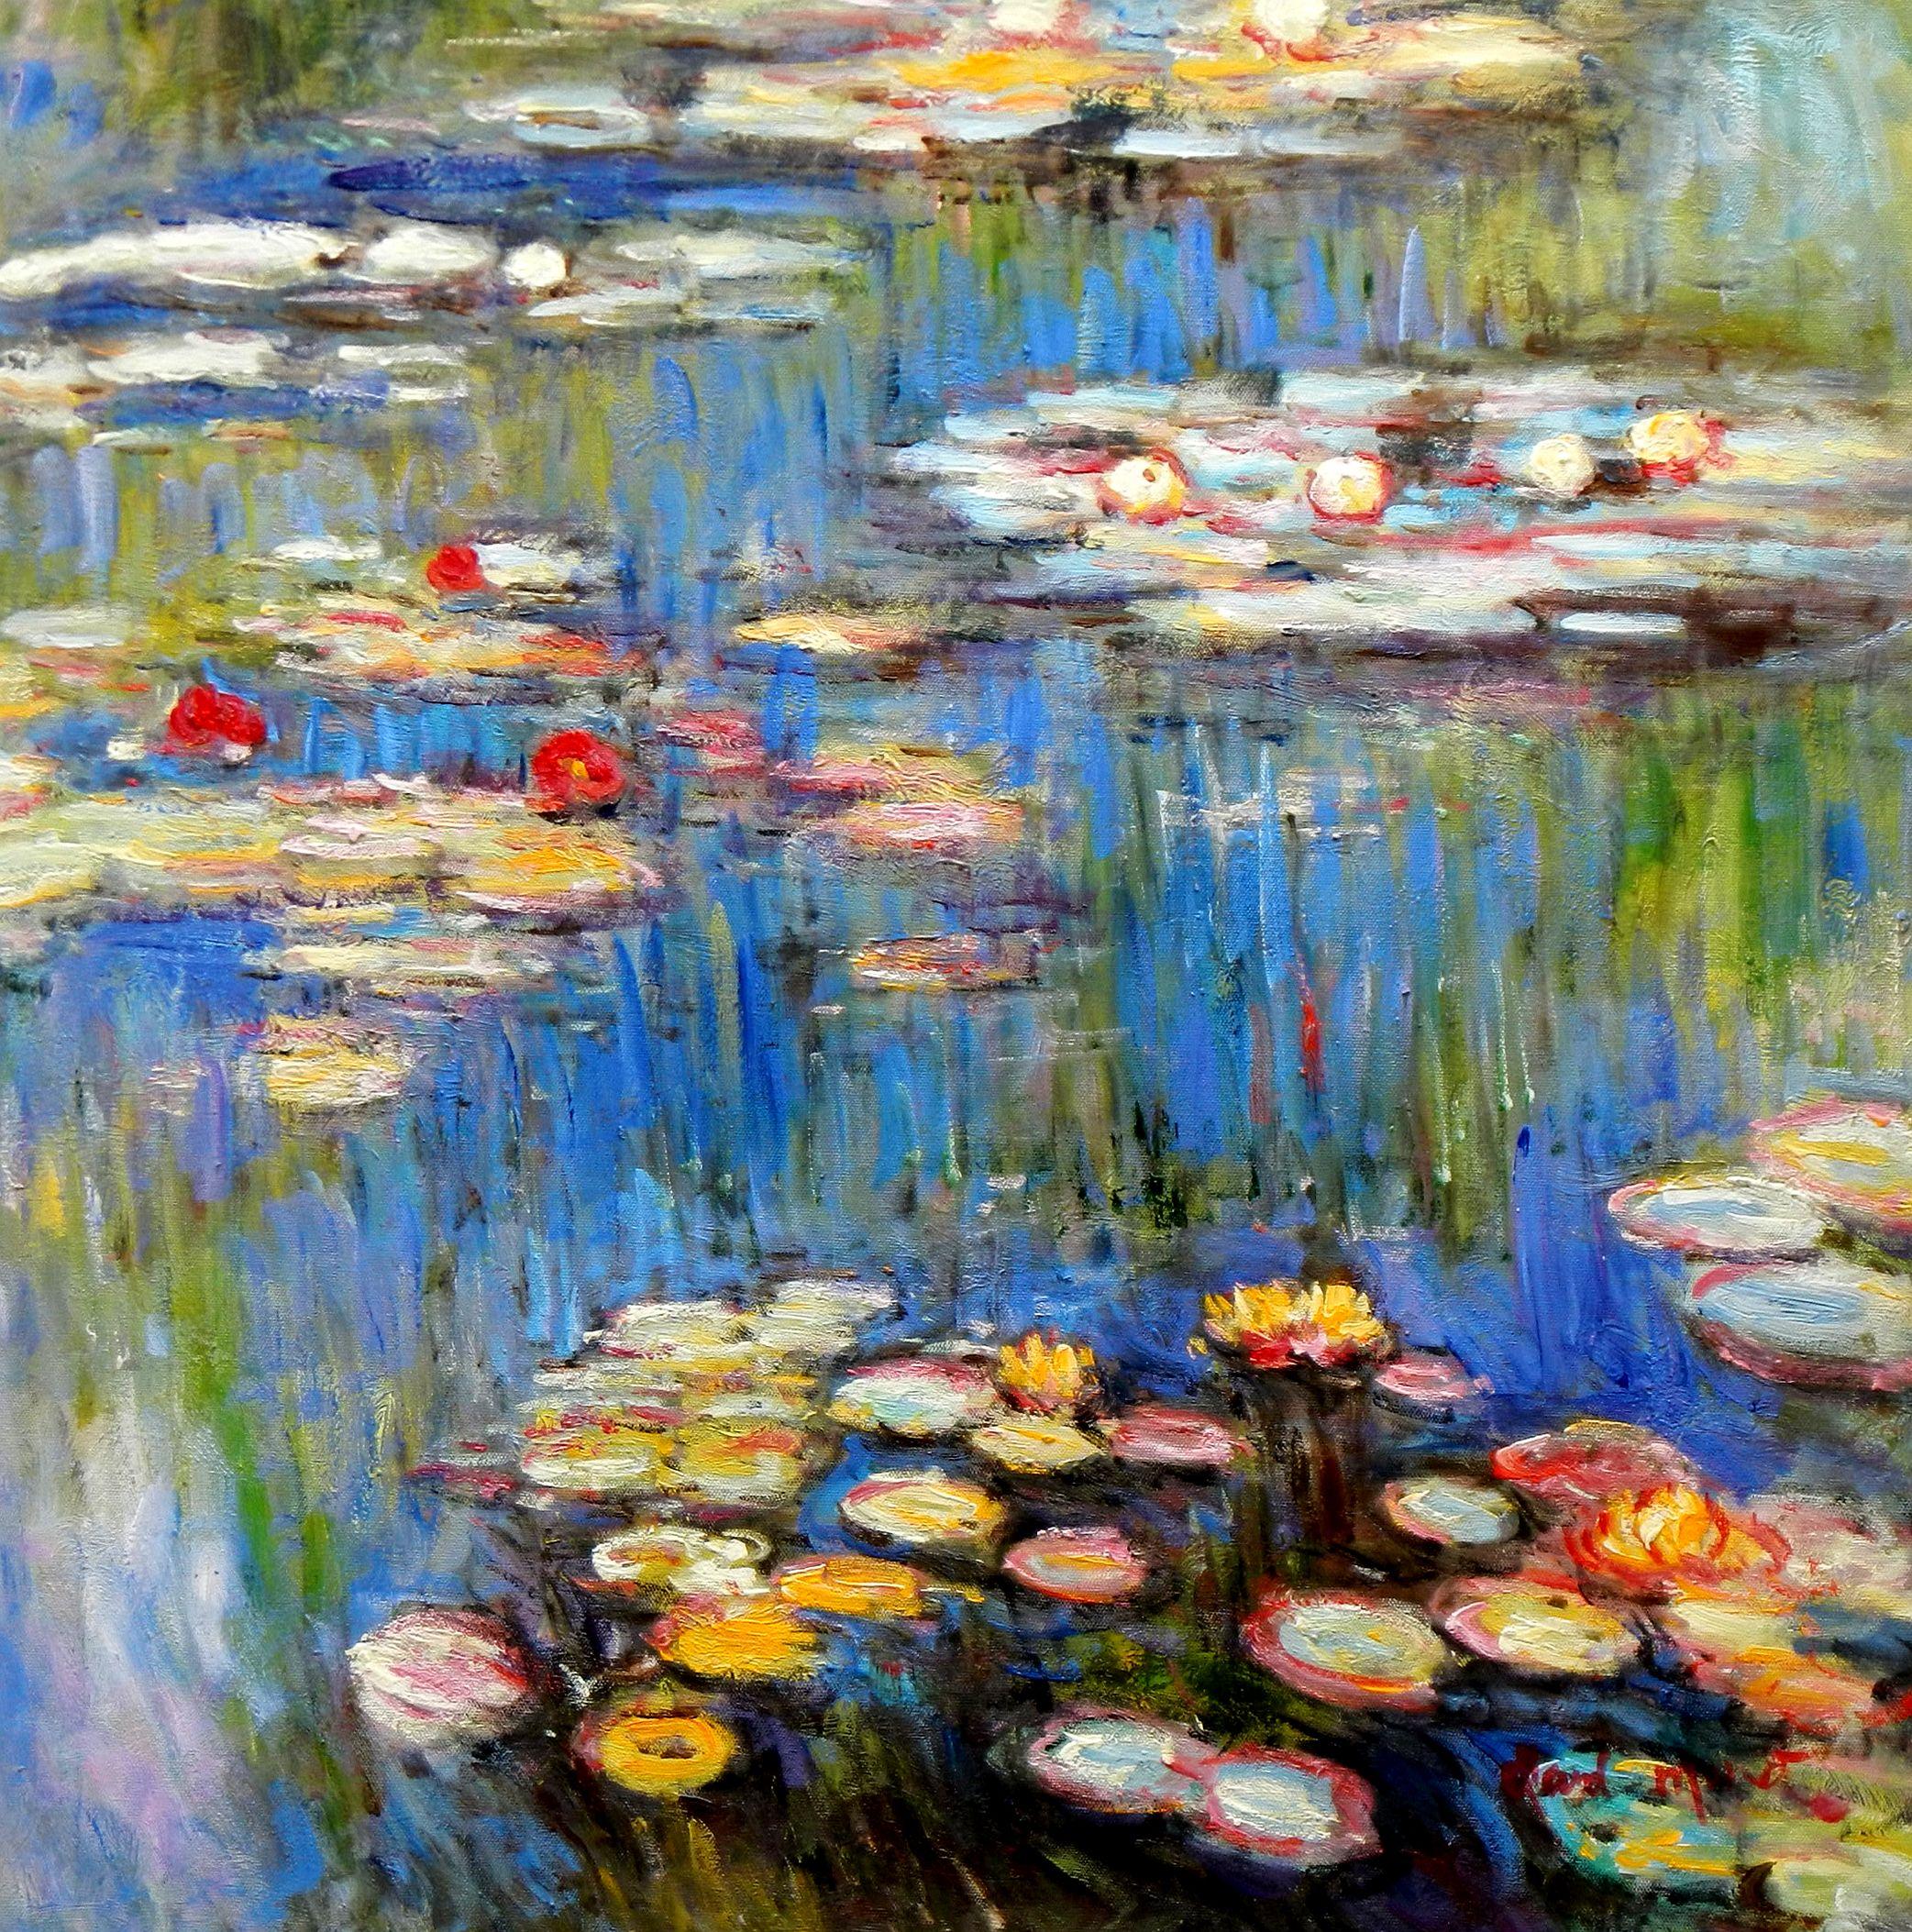 Claude Monet - Seerosen im Frühling e96693 60x60cm Ölgemälde handgemalt